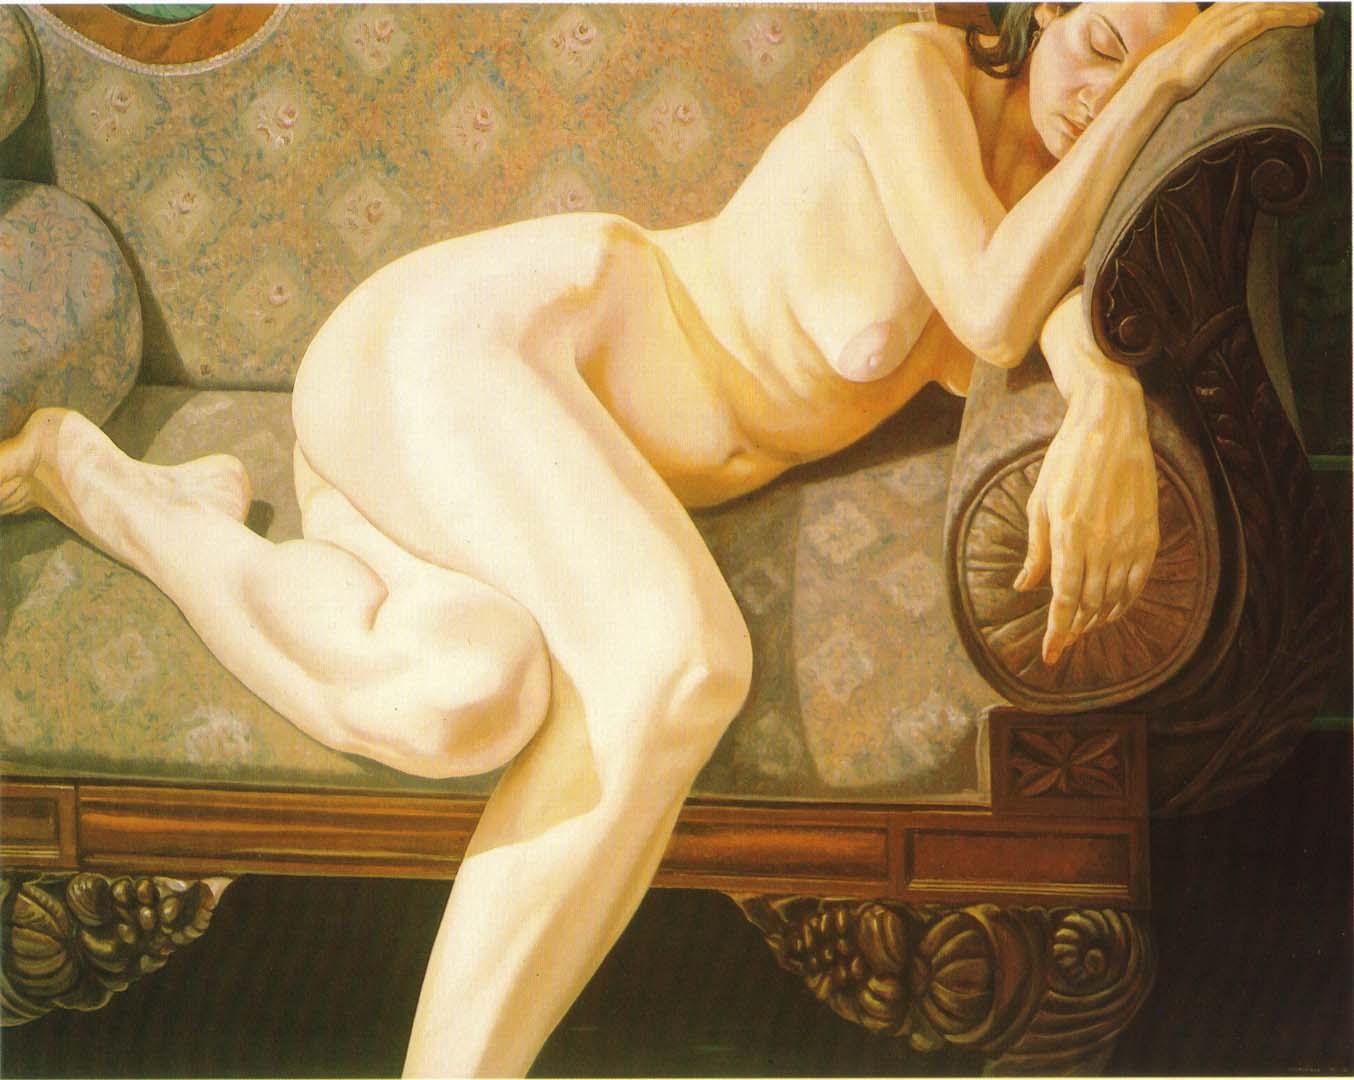 1973 Female Model Reclining on Empire Sofa Oil on Canvas 48 x 60